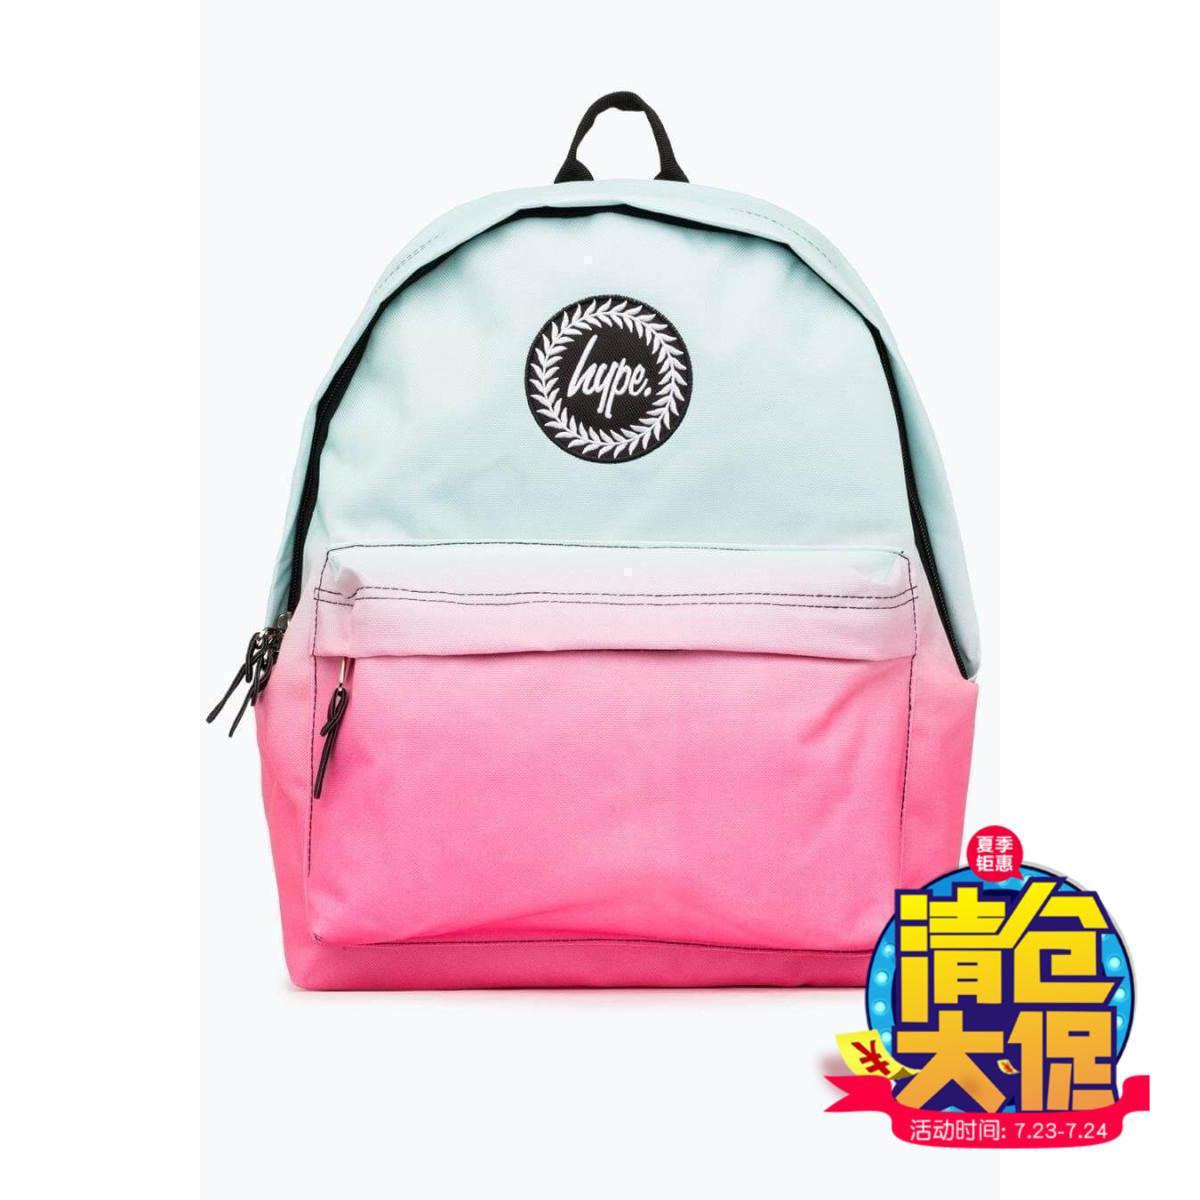 Multifungsi Laki Laki Ketek Tersembunyi Ketiak Bahu Bag Kantonghitam Source · Multifungsi Messanger Bags Sling Bahu